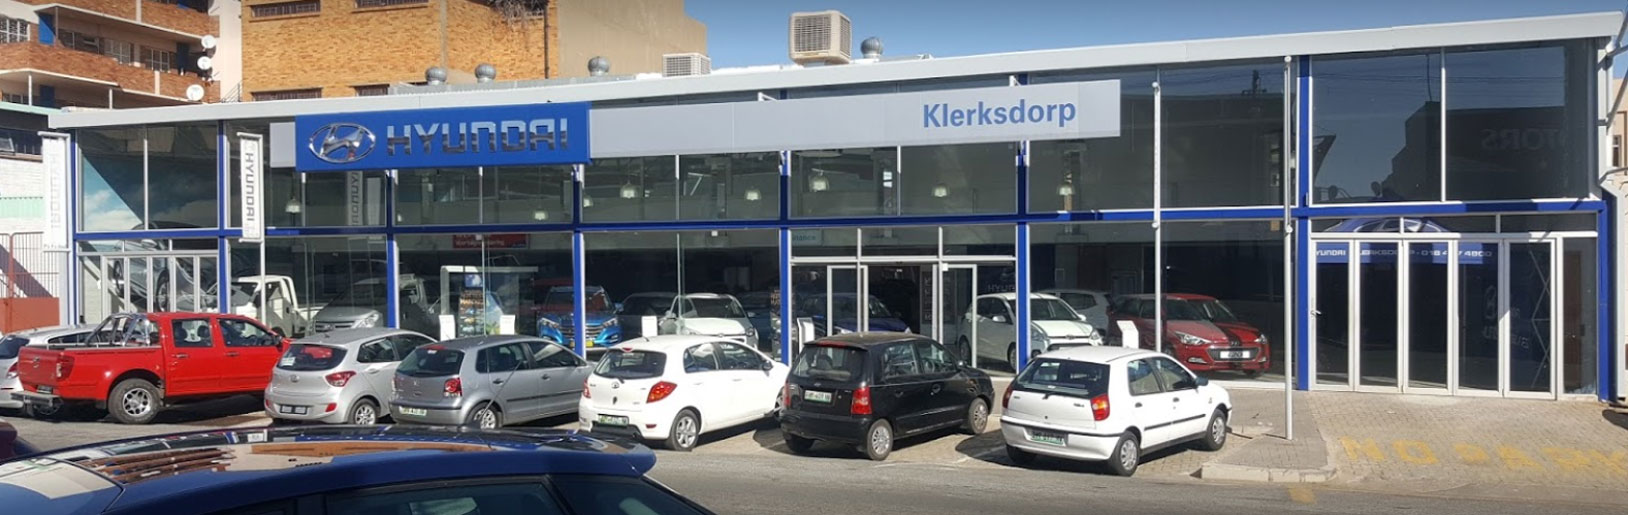 Kia Klerksdorp  dealer image0